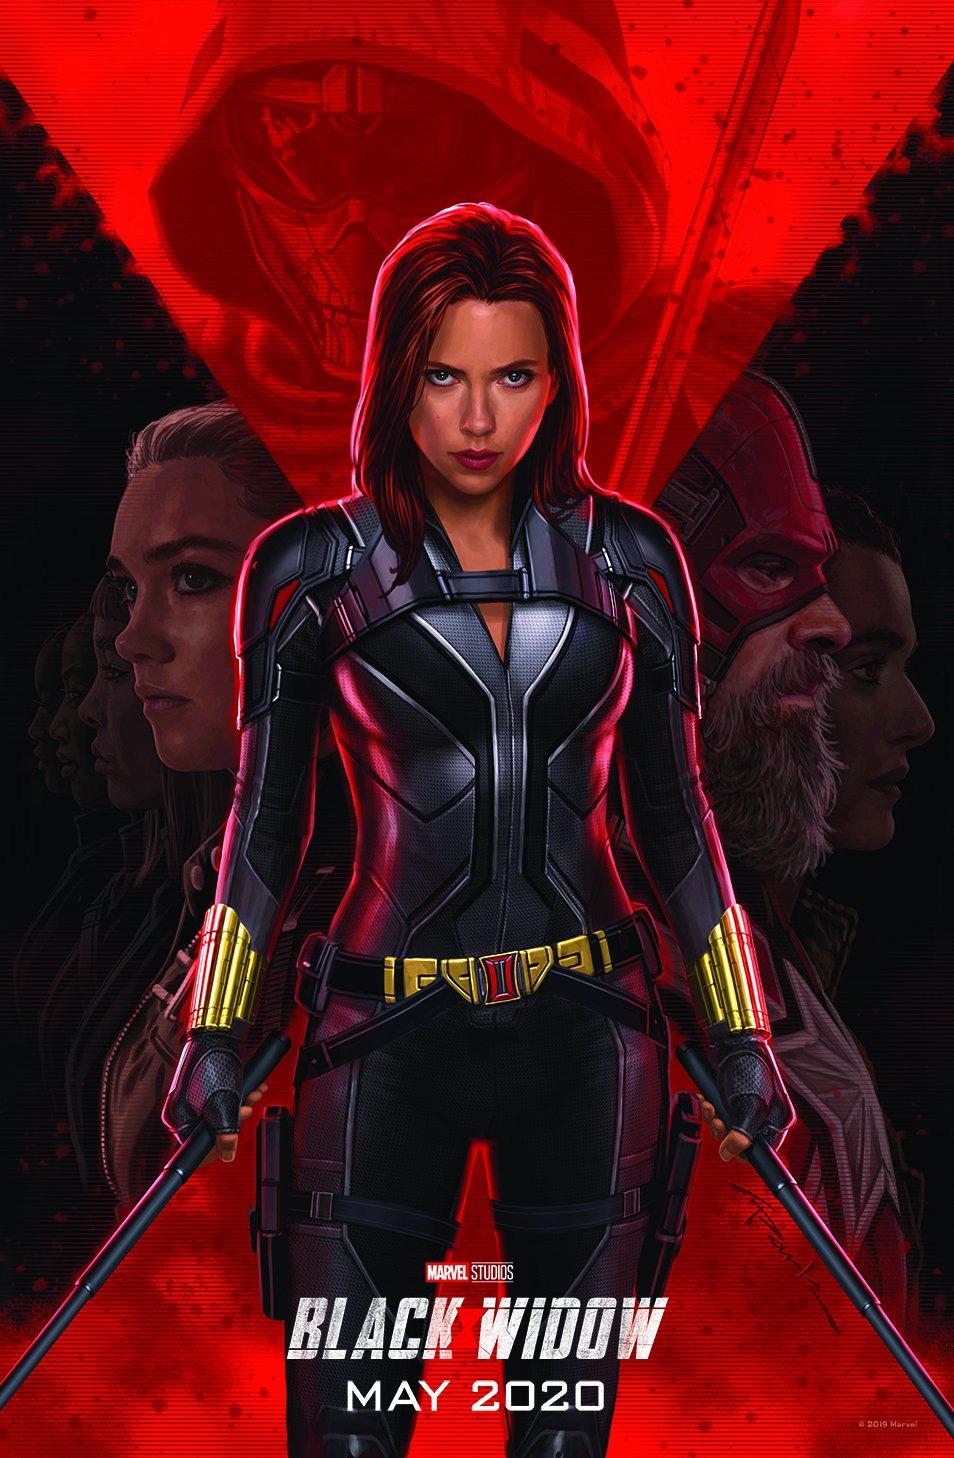 Black Widow (2020) Official Hindi Trailer 1080p HDRip